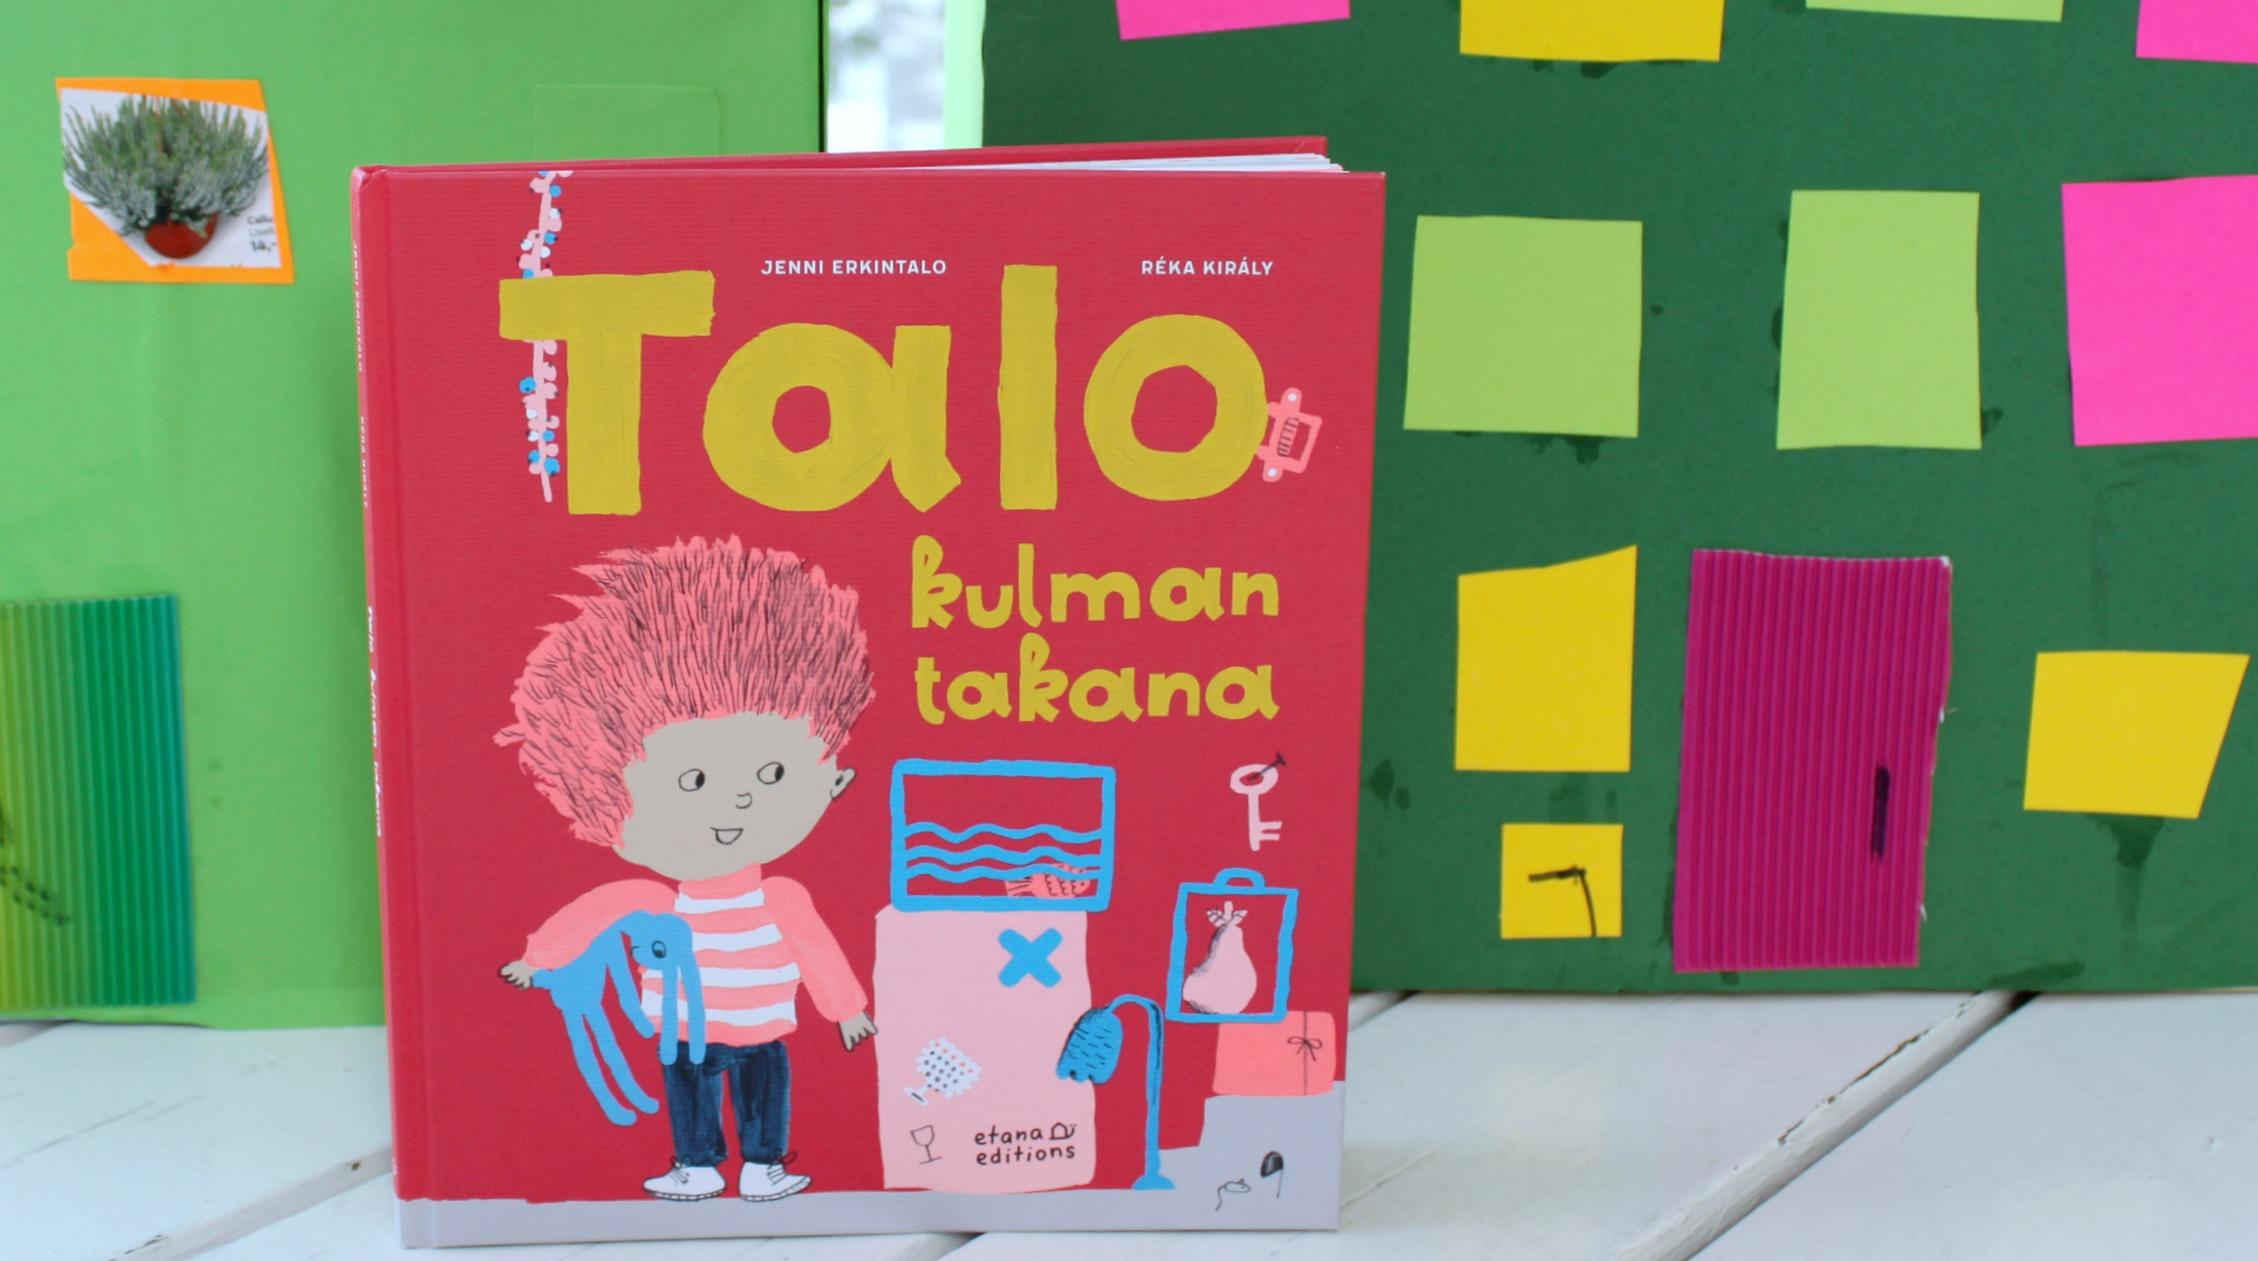 Talo kulman takana (Etana Editions 2016)